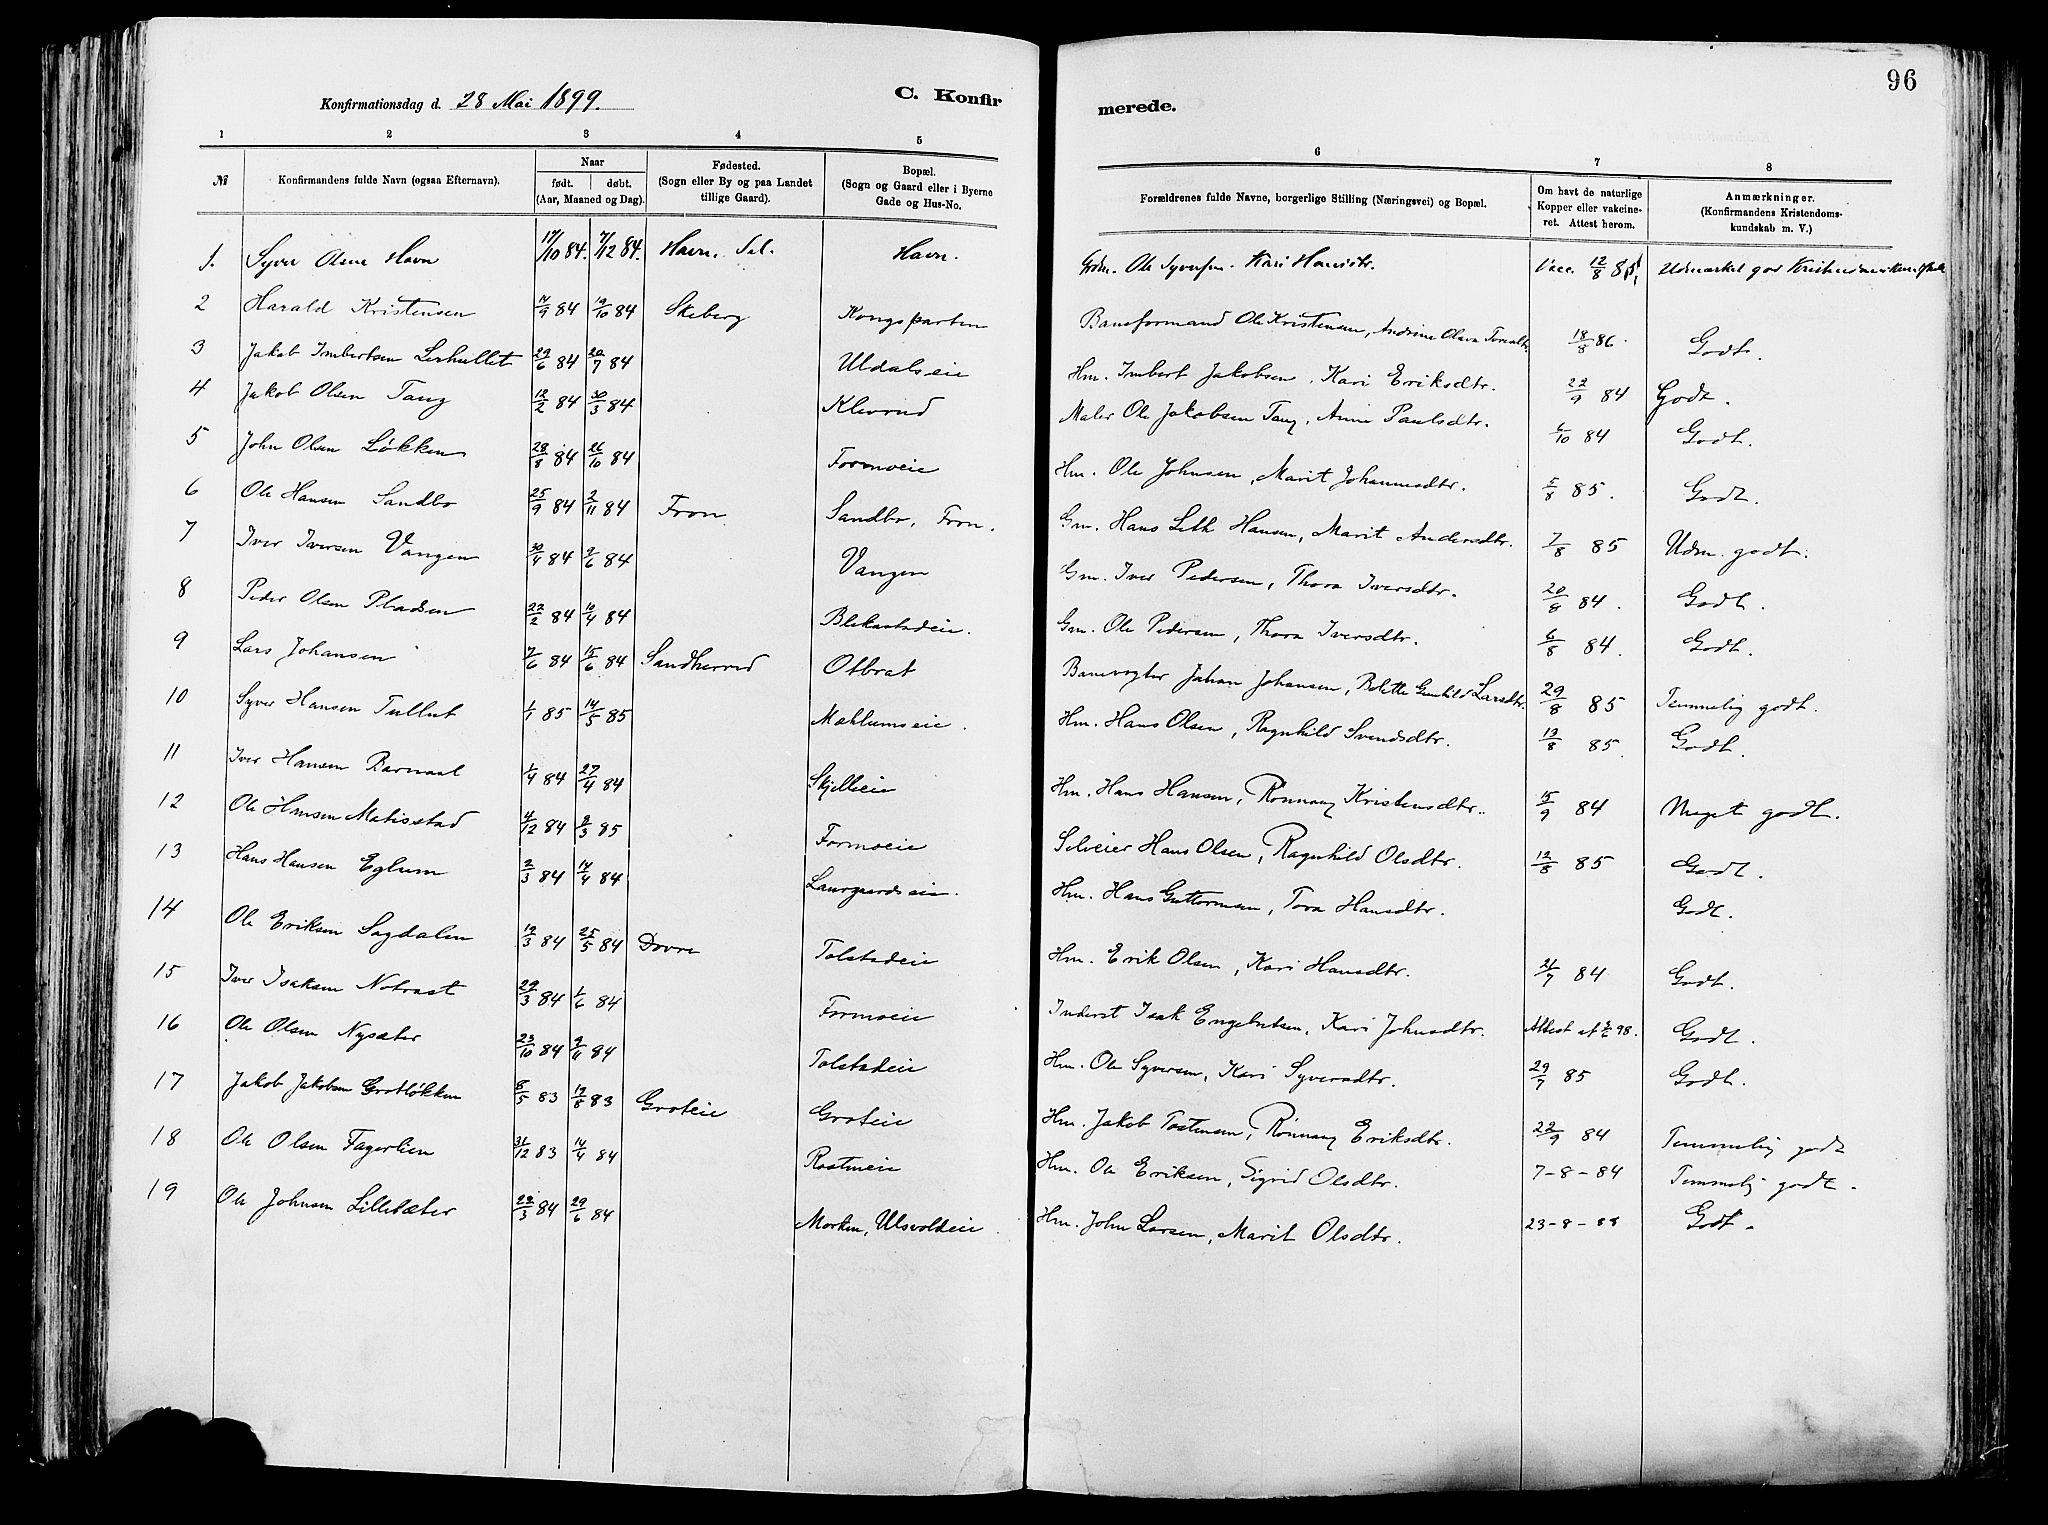 SAH, Vågå prestekontor, Ministerialbok nr. 8, 1886-1904, s. 96